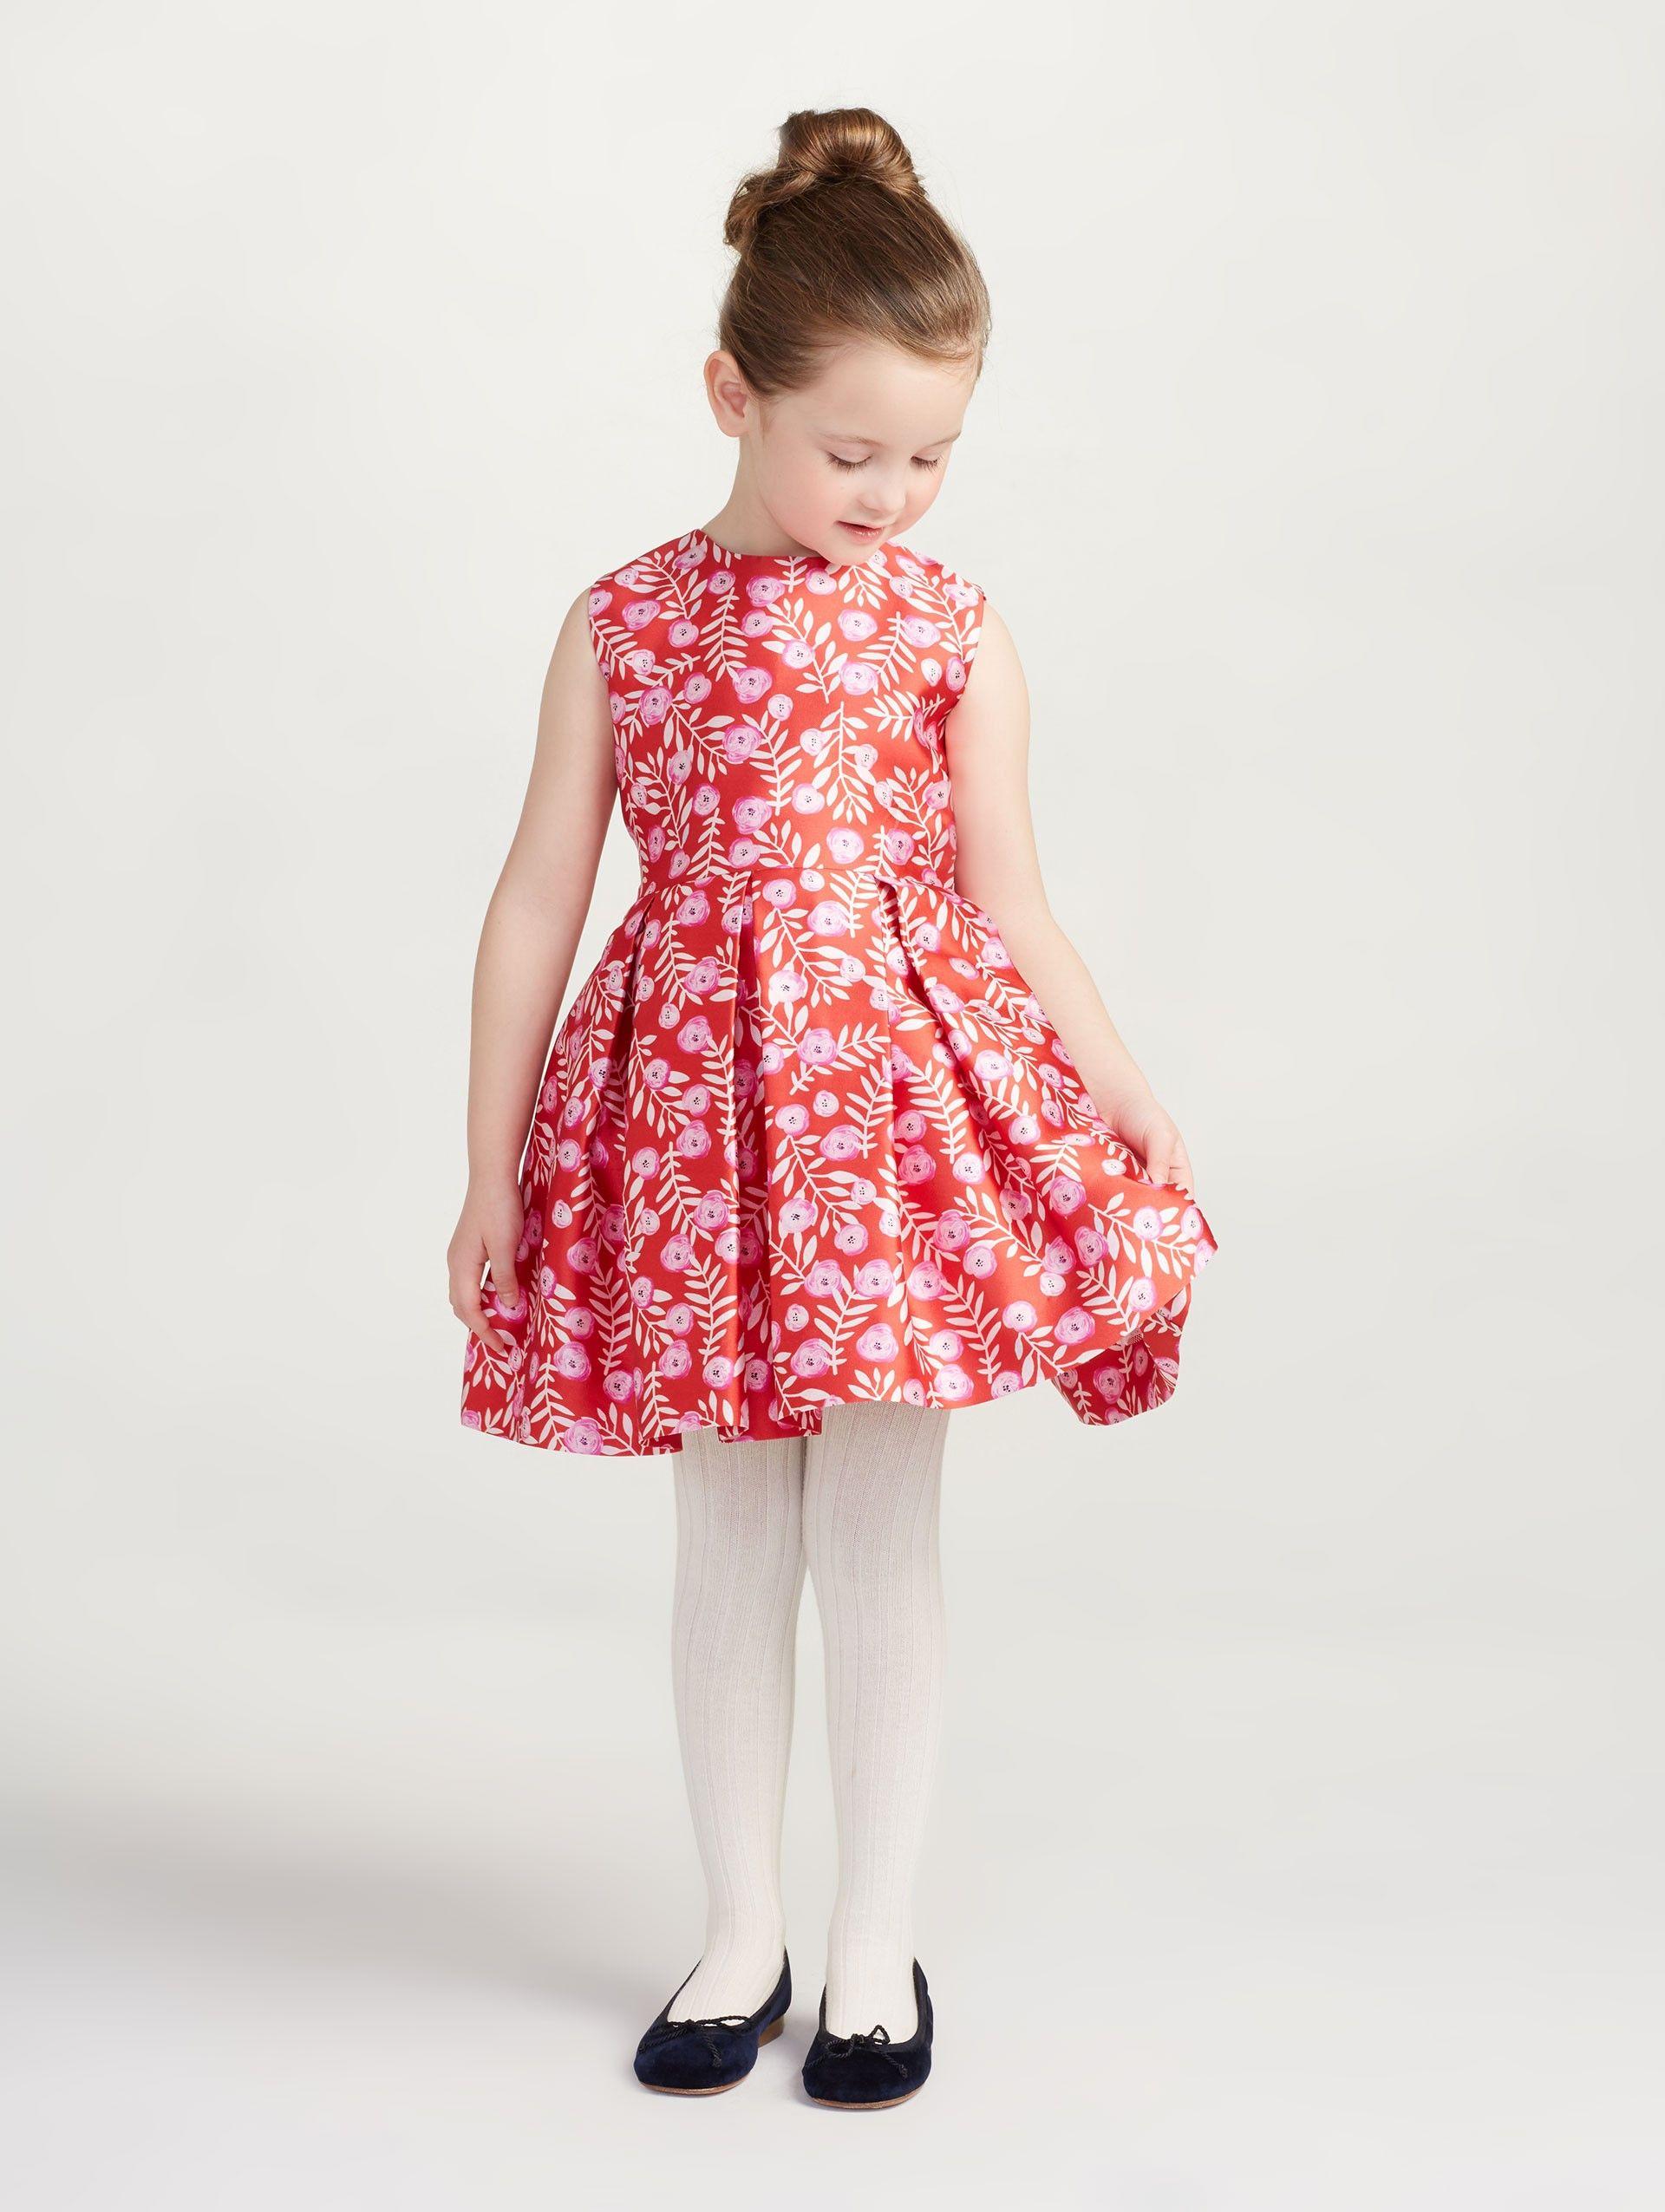 6a8321dbc7a Oscar de la Renta - Petite Roses Mikado Party Dress